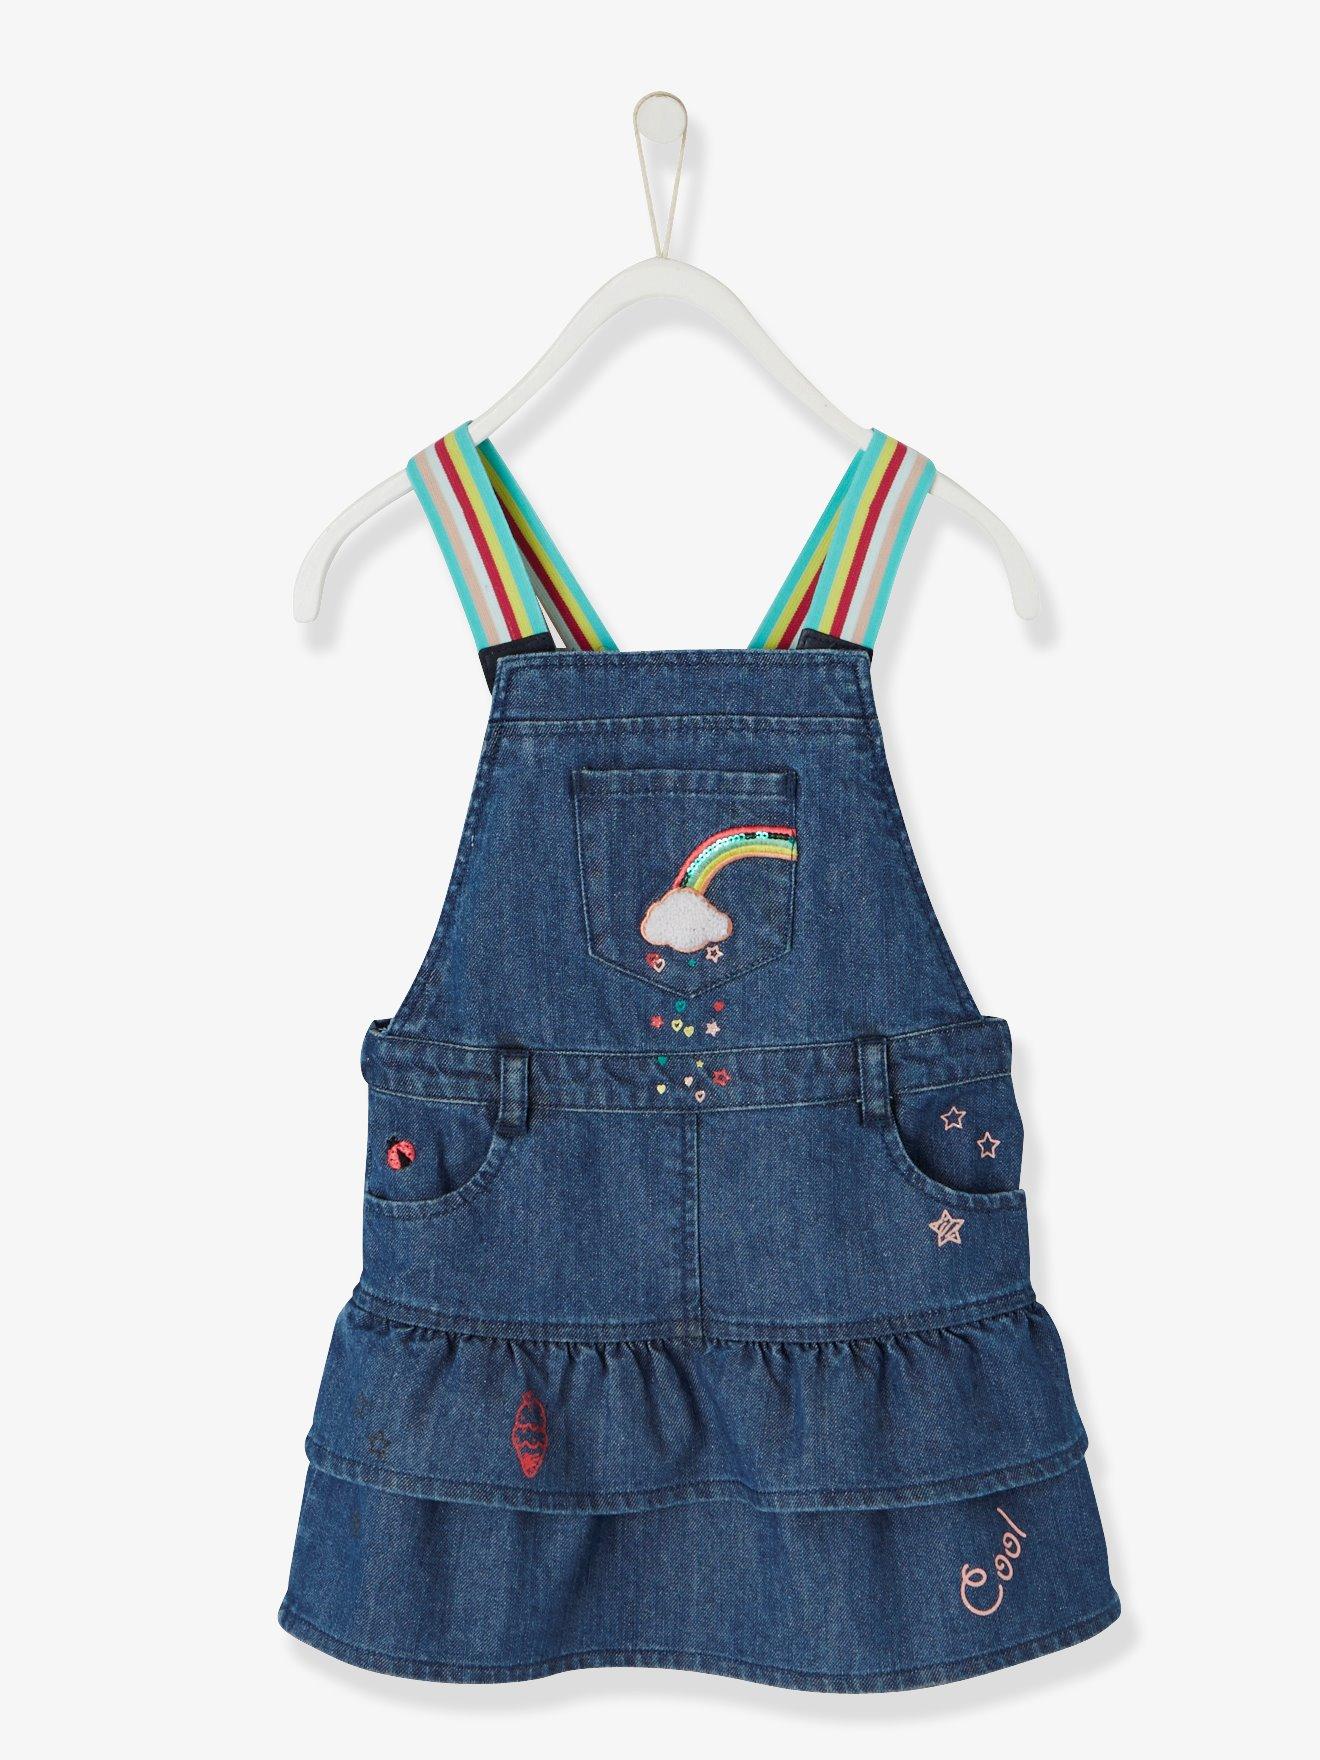 denim-dungaree-dress-with-iridescent-graffiti-for-girls